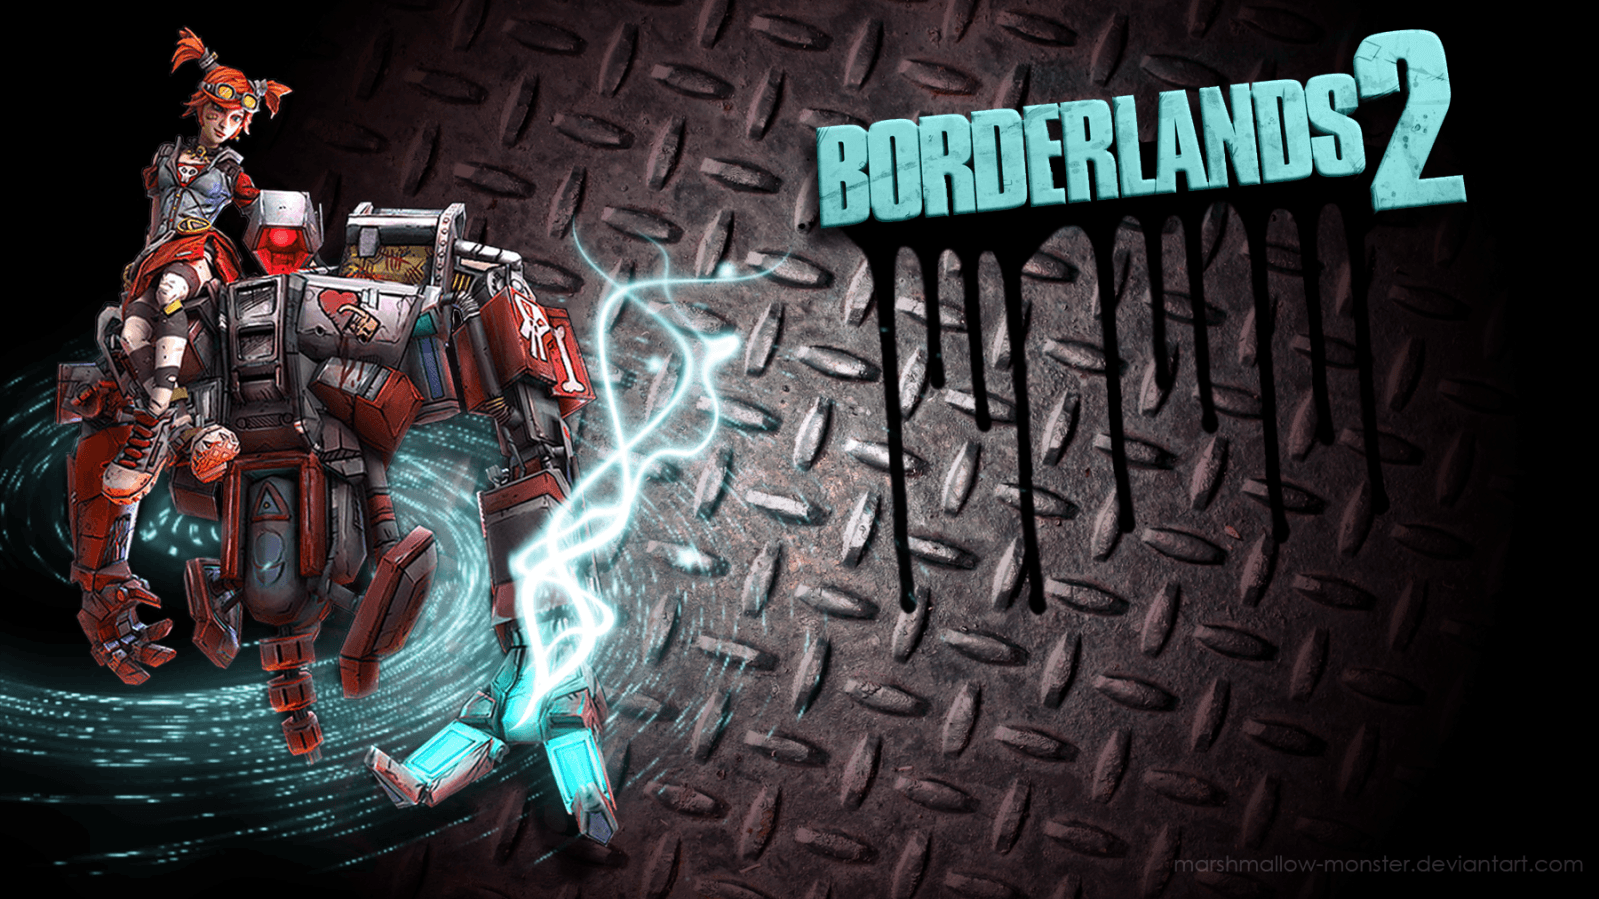 Borderlands 2 Backgrounds HD Mechromancer - Wallpaper Cave